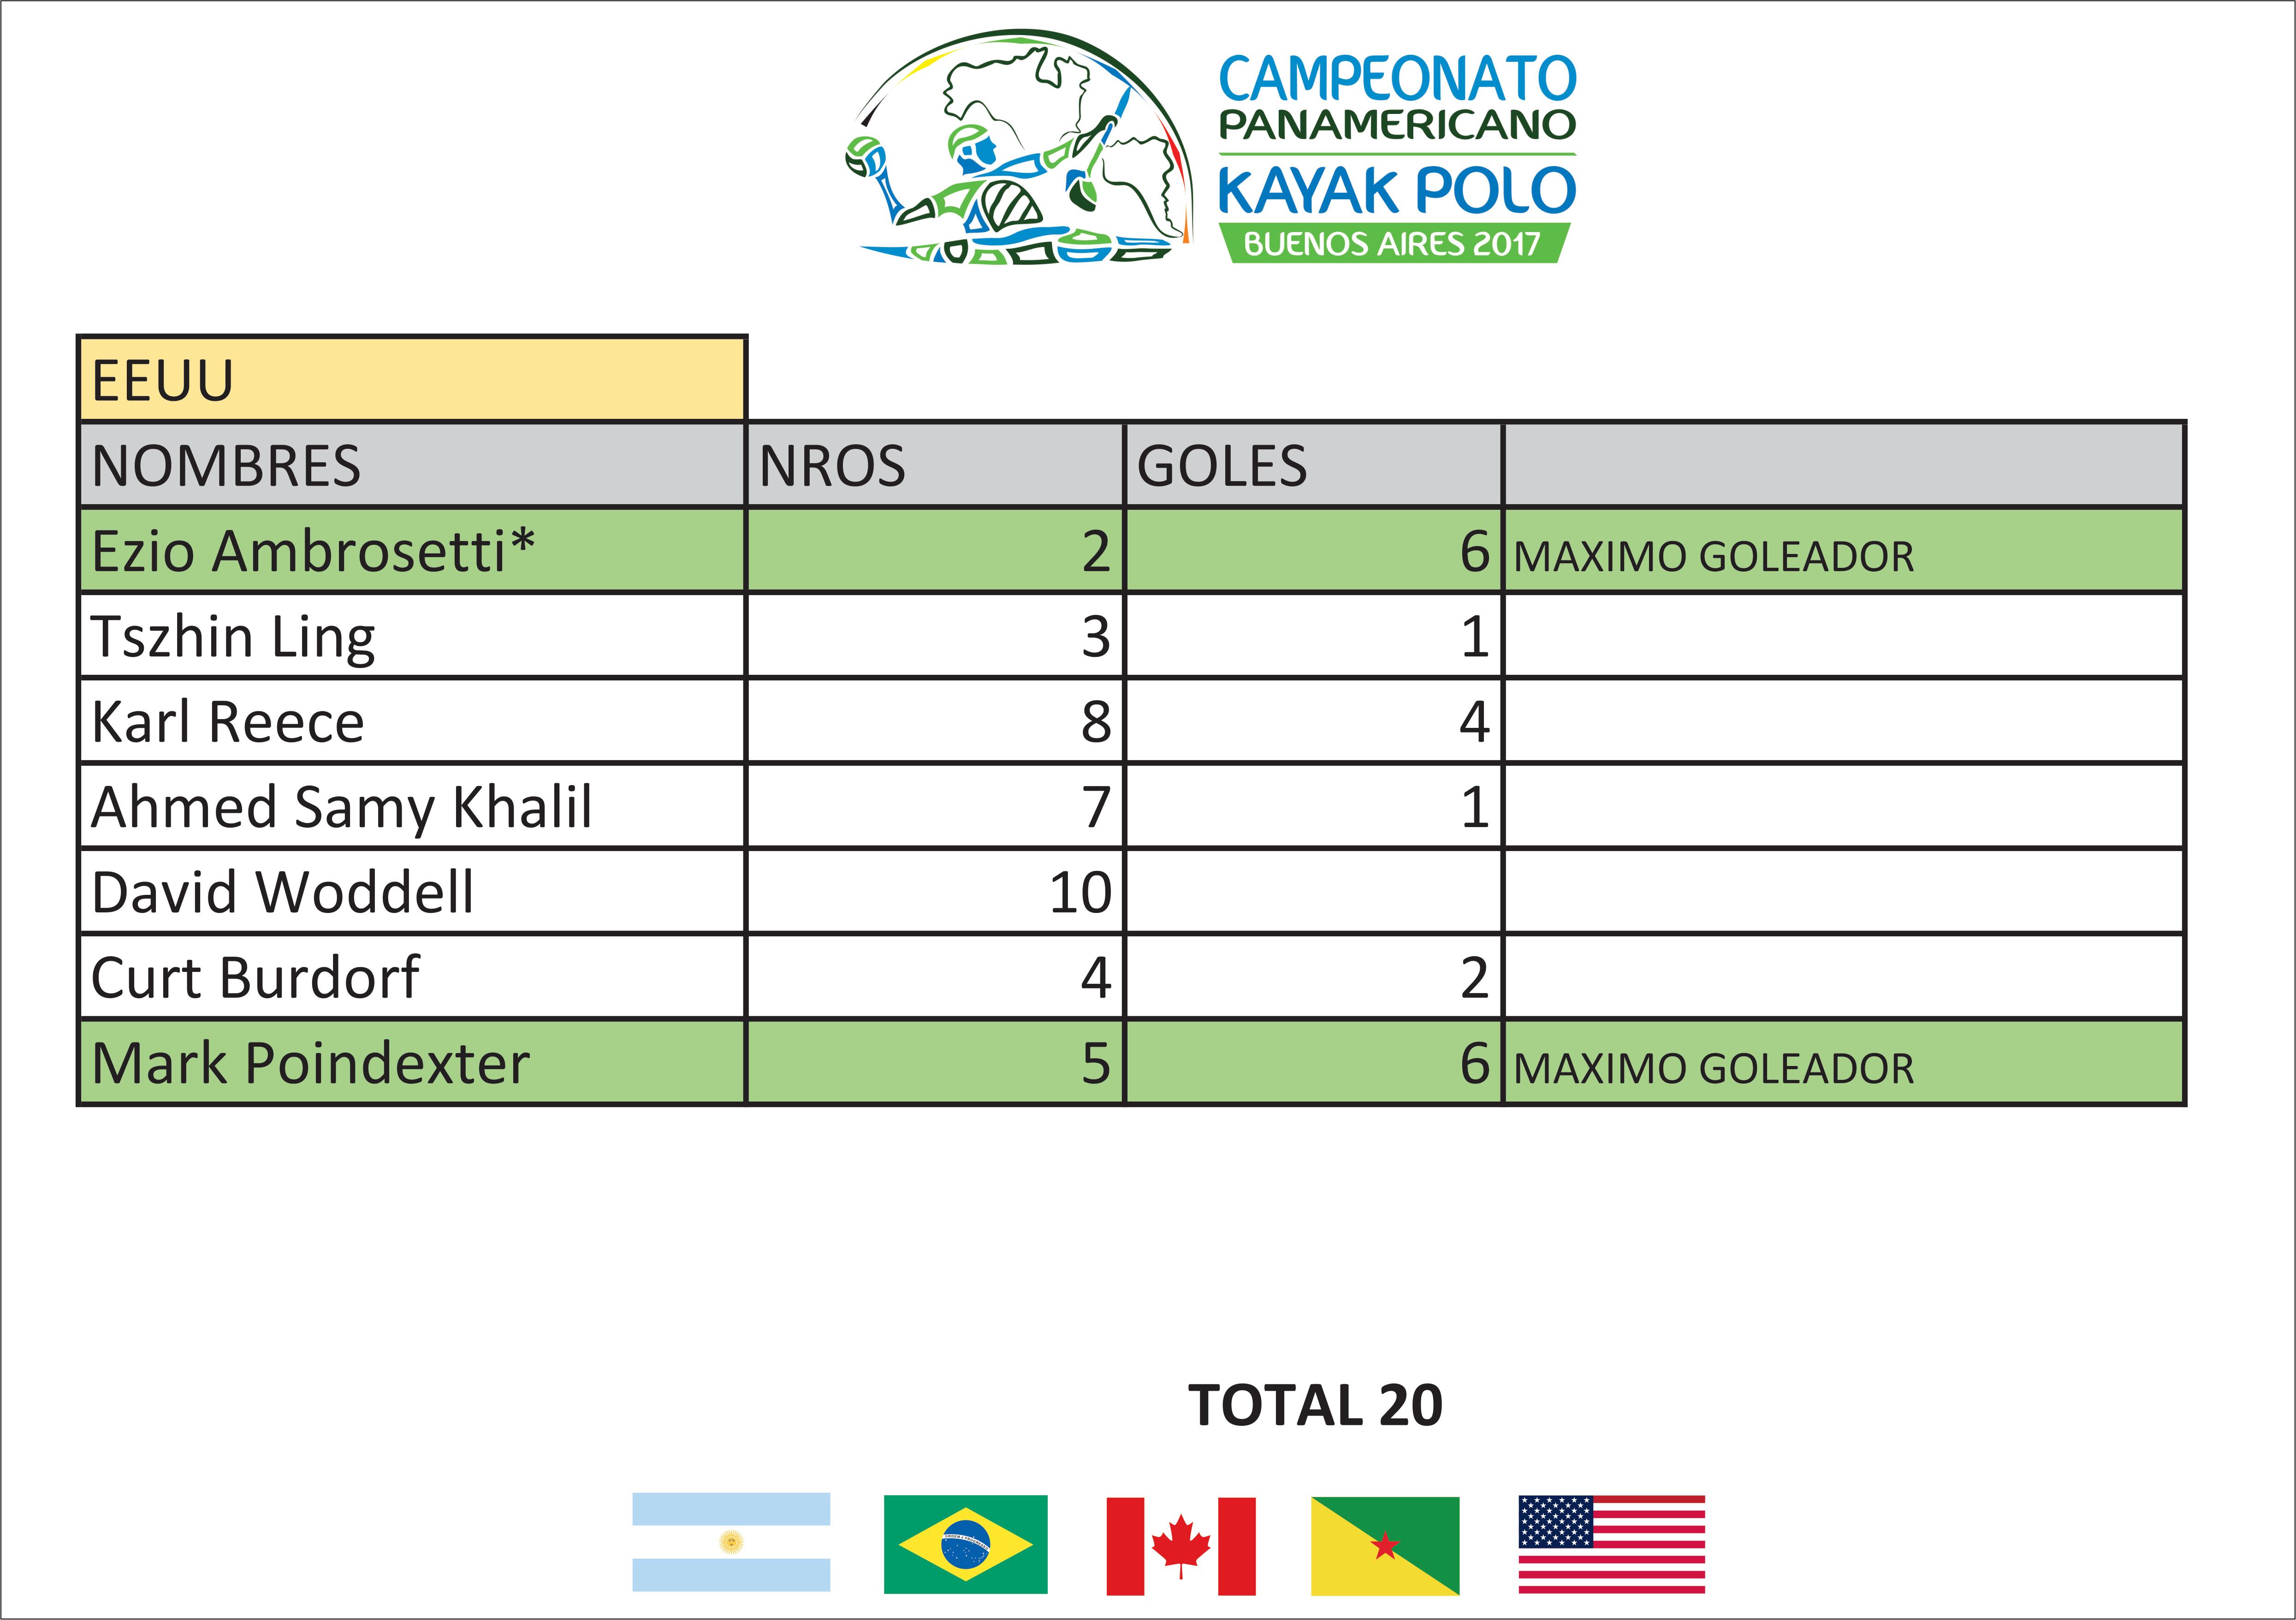 EEUU Goleadores - Panamericano